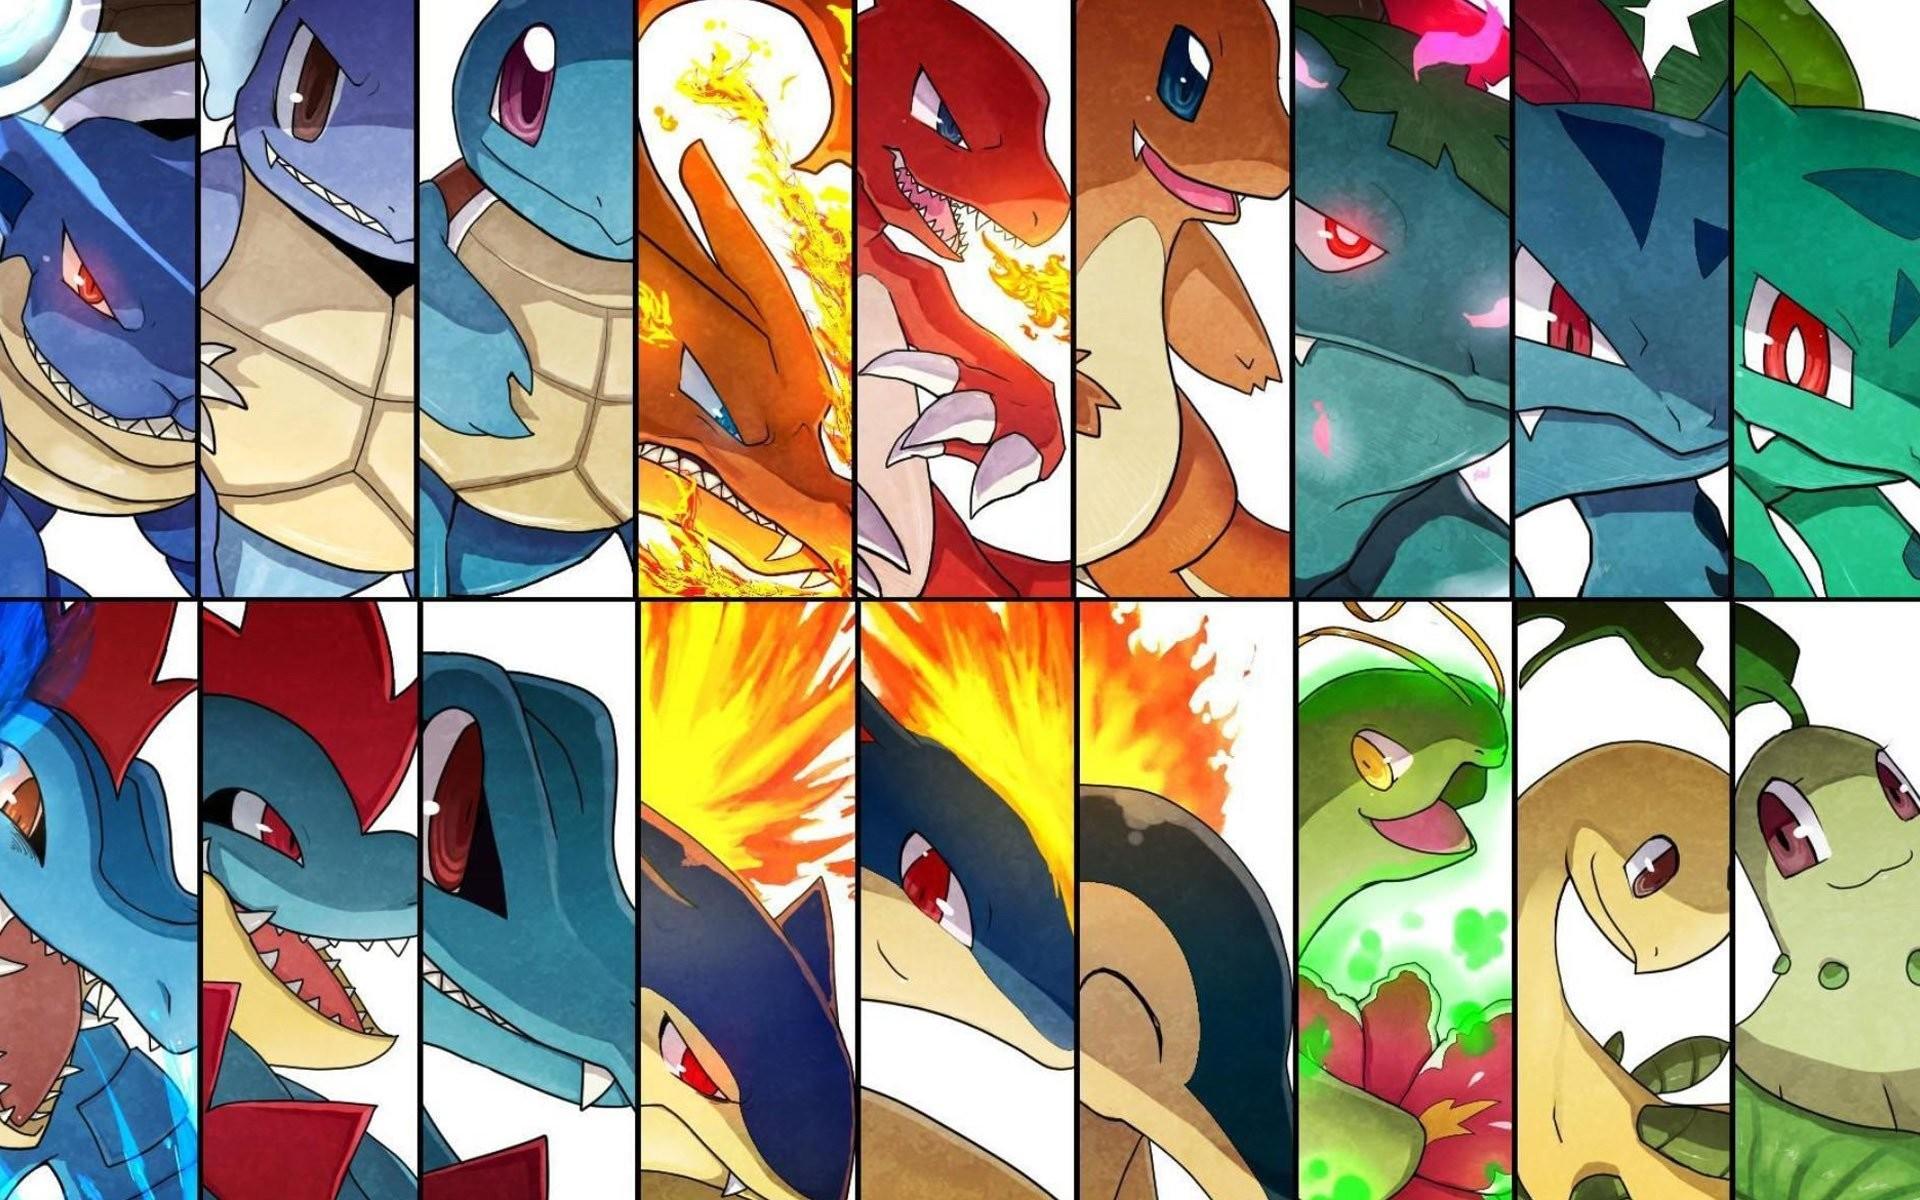 Res: 1920x1200, Download Pokemon Charizard Image Free.